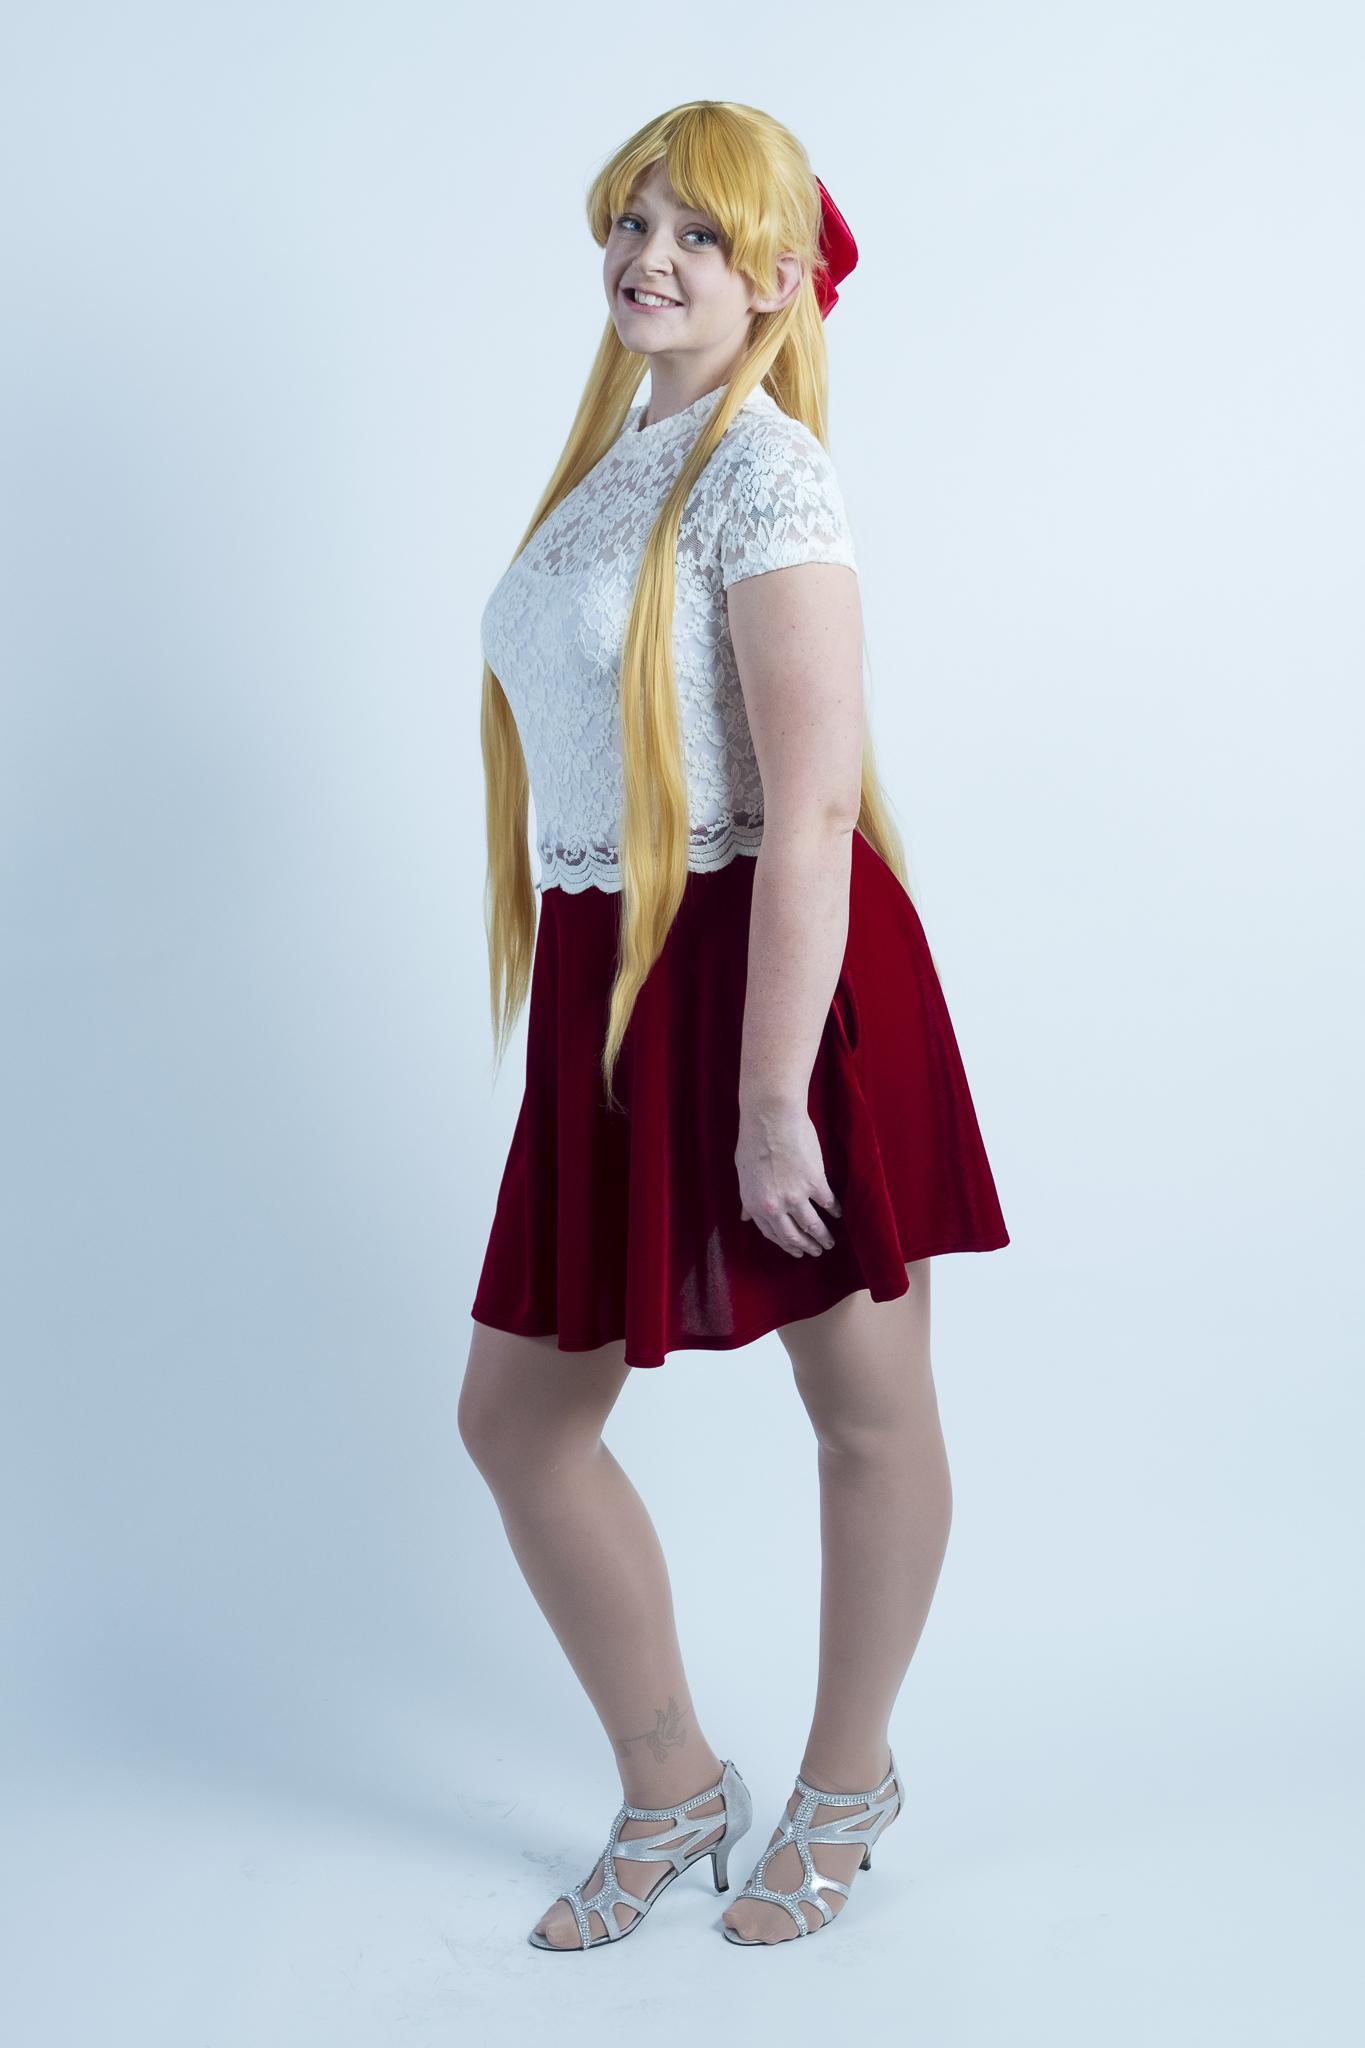 Allybelle Cosplay in Minako Aino cosplay at Waveform Austin